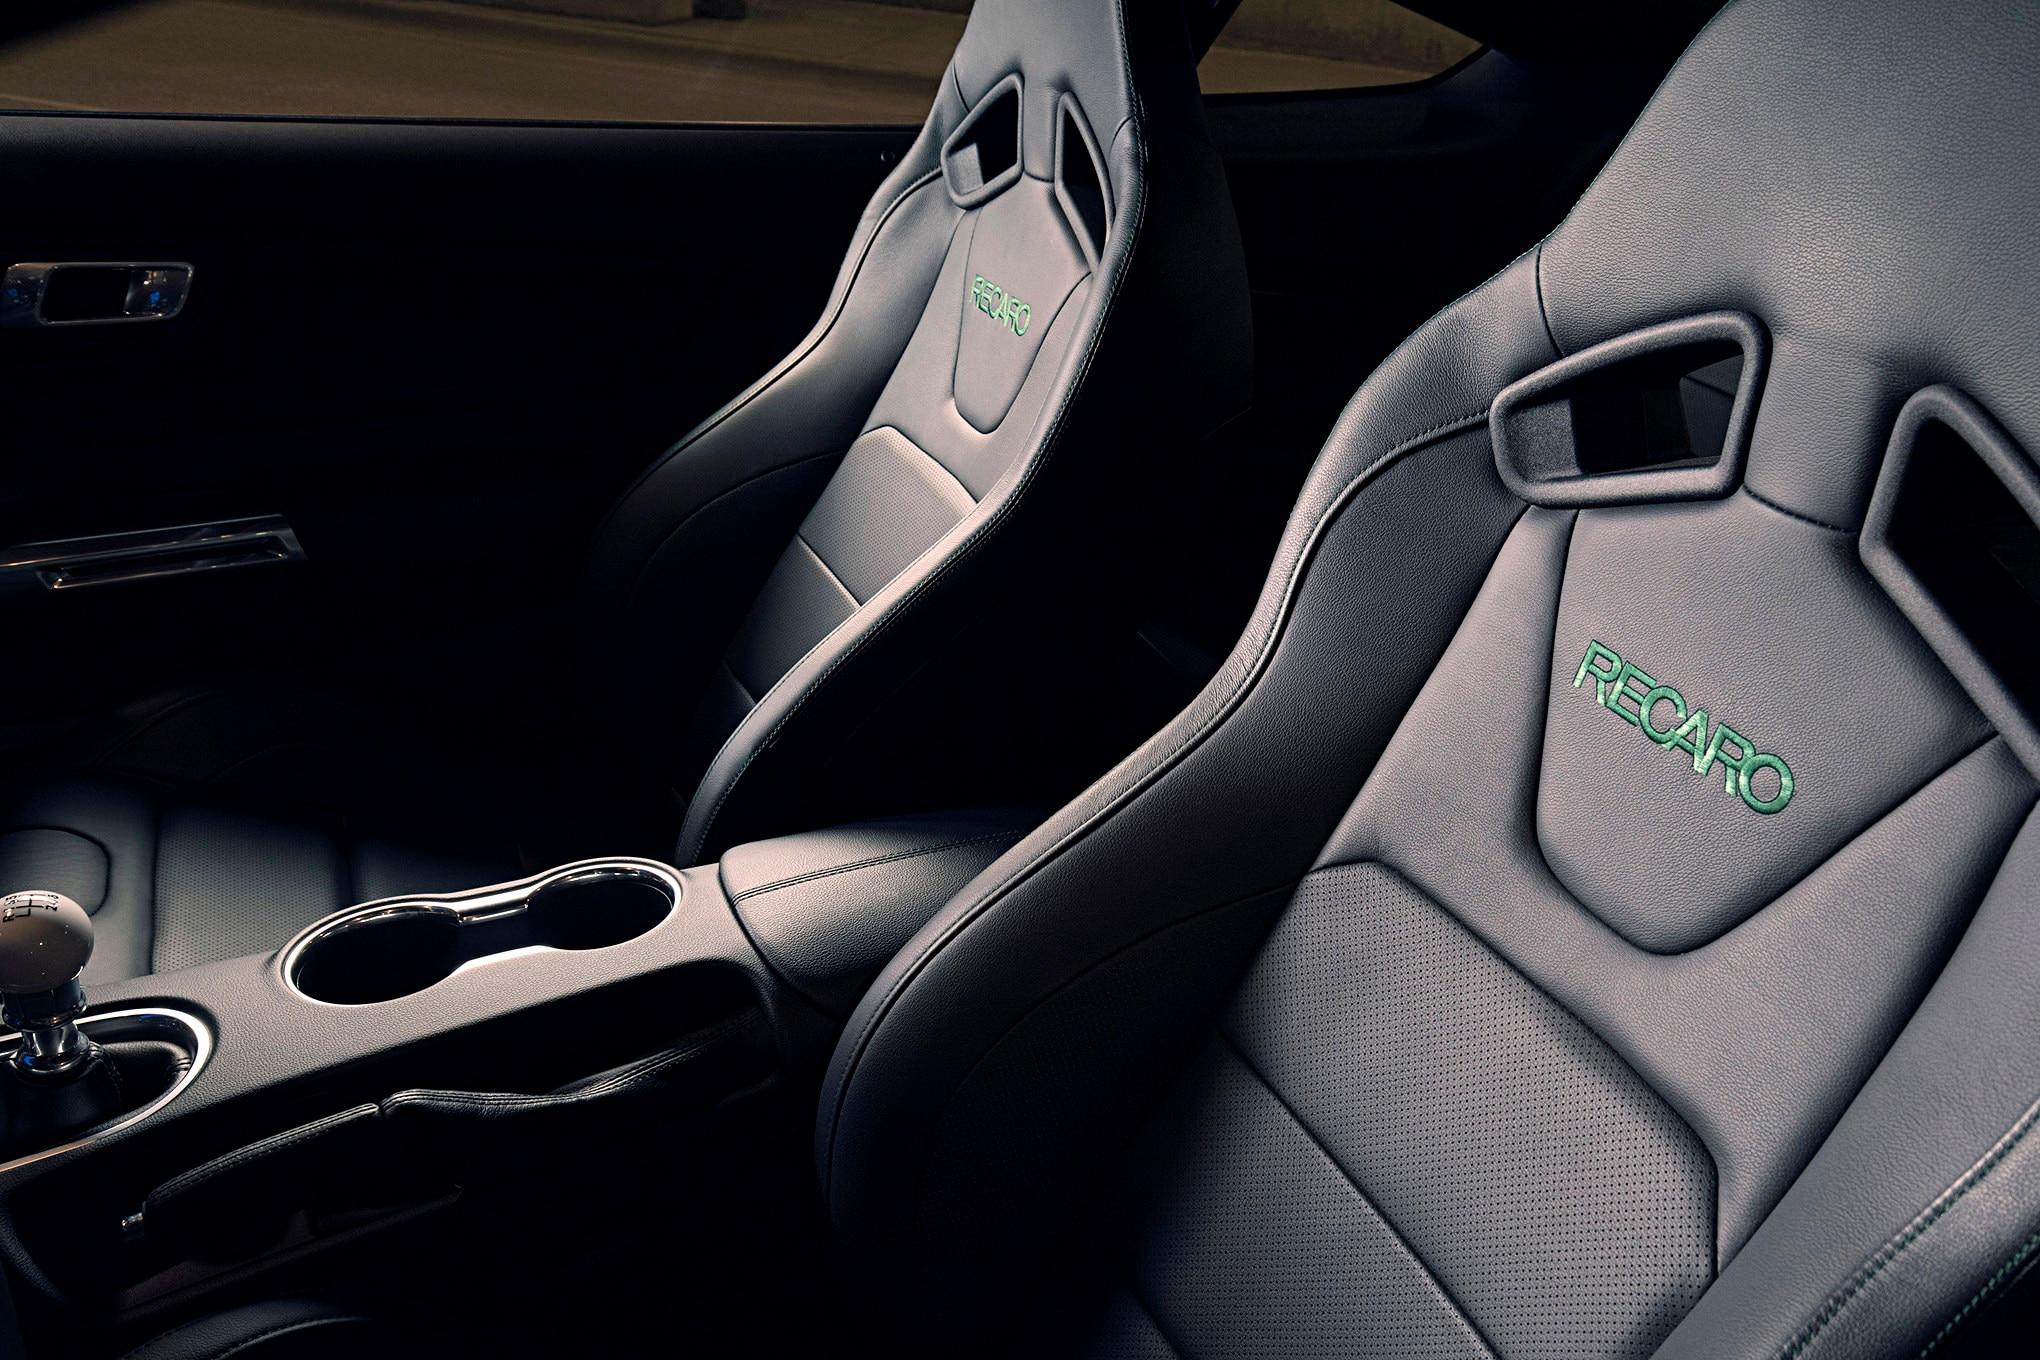 05 2019 Mustang Bullitt Optional Recaro Seats Photo 160500163 2019 Mustang Bullitt Unveiled At Naias